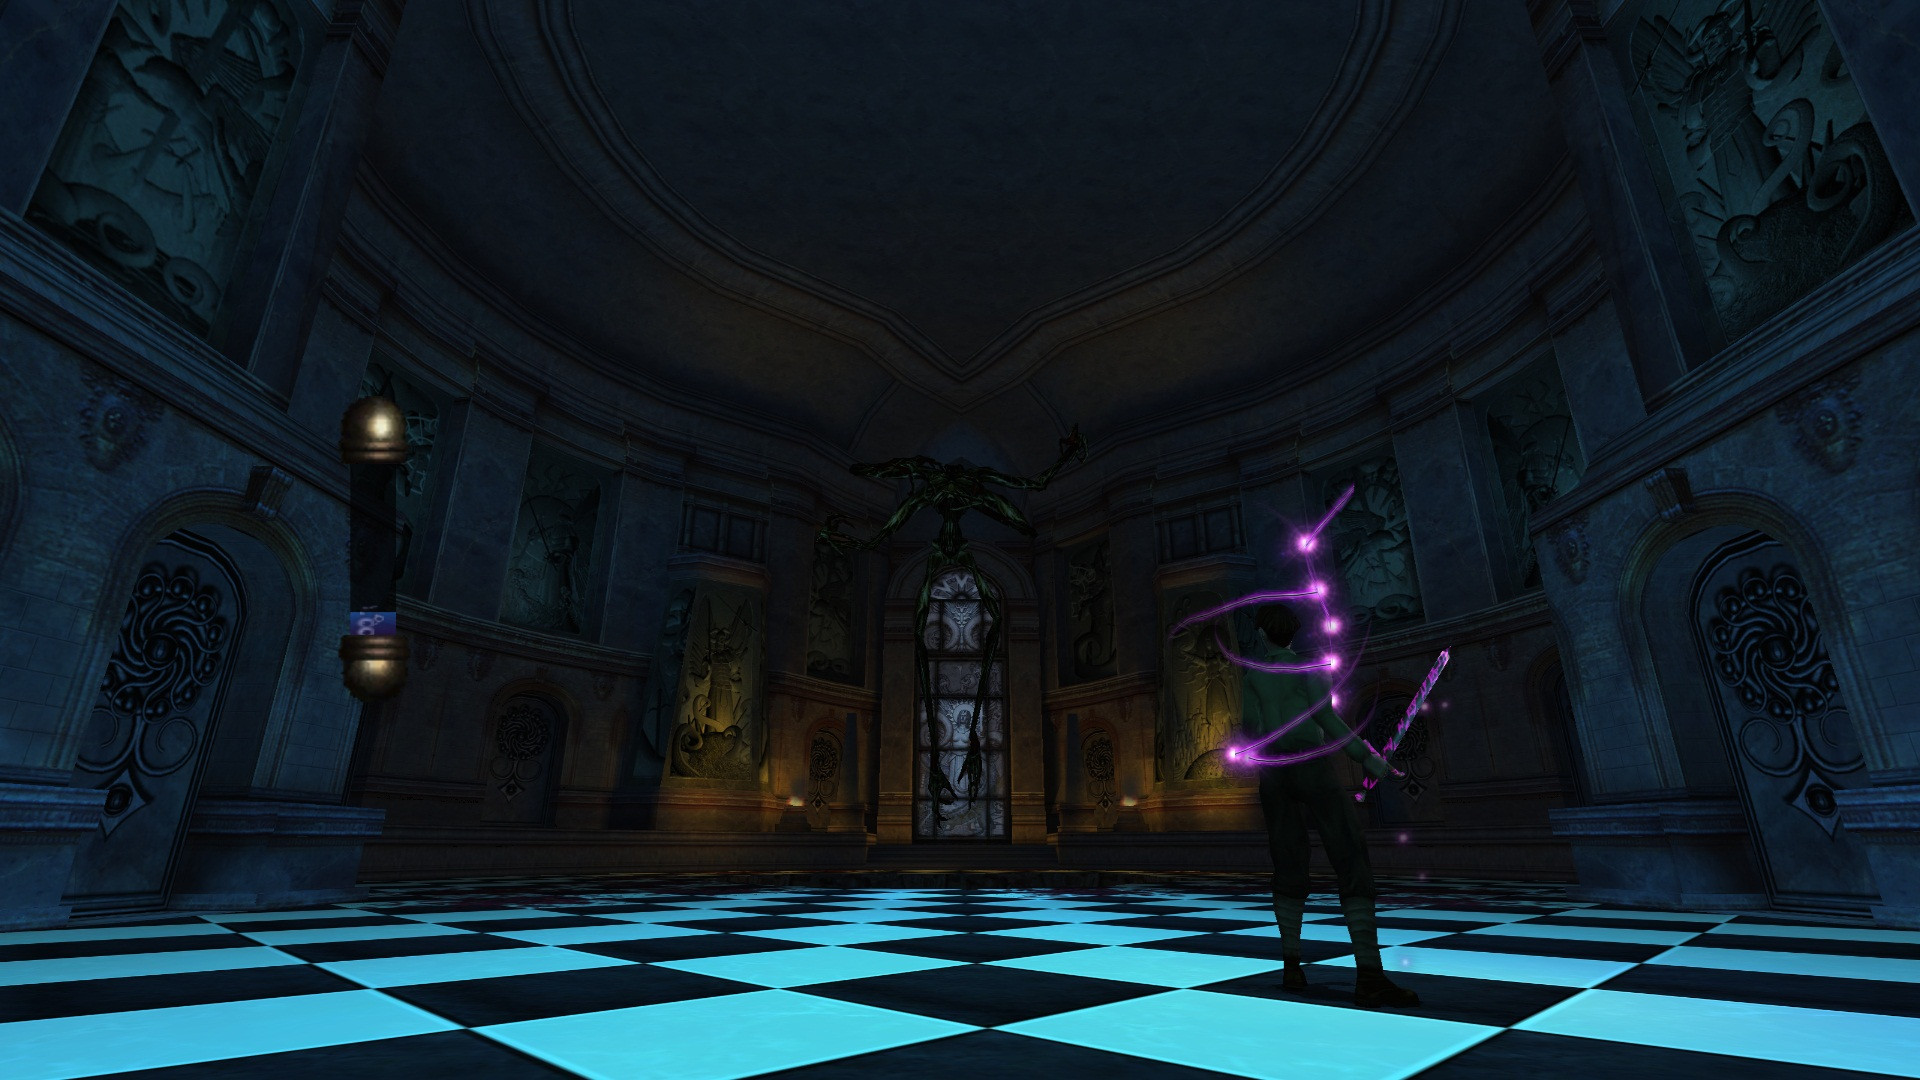 Spooky Games To Play in The Dark: ETERNAL DARKNESS SANITY'S